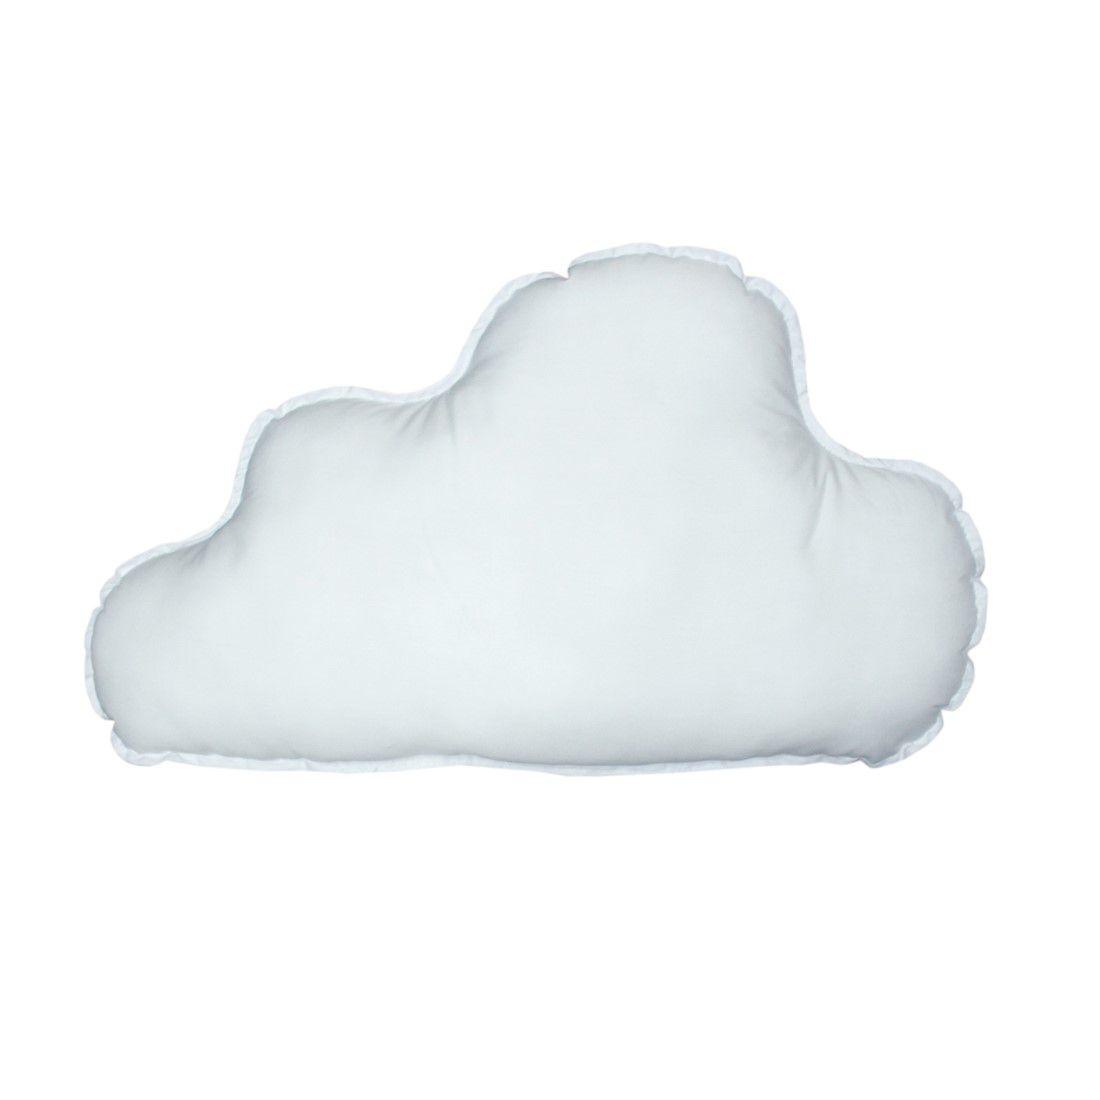 Almofada nuvem grande branca